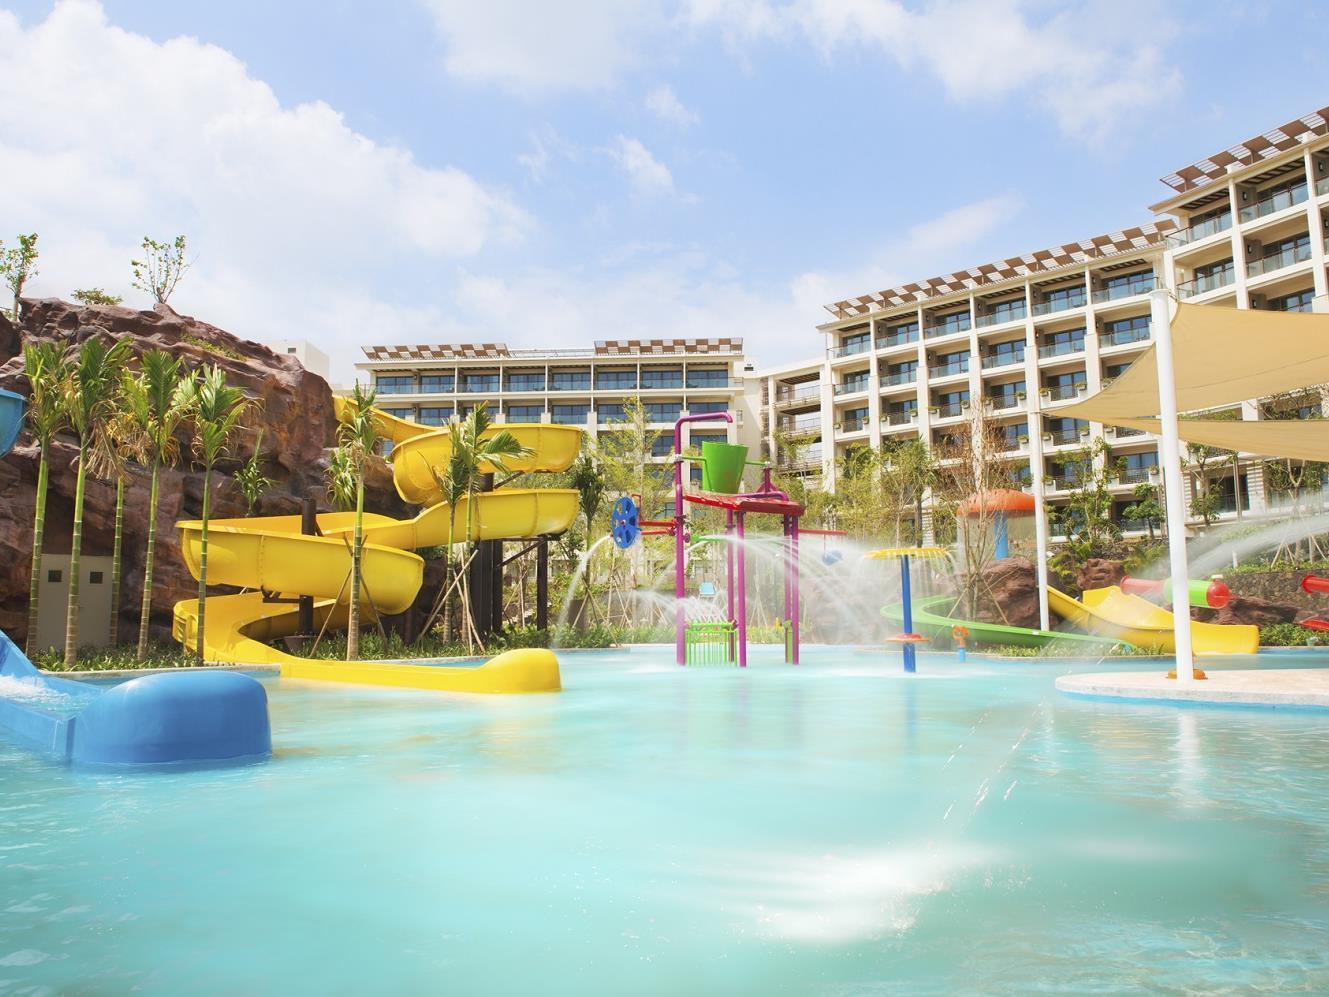 Shangri-La Sanya Resort & Spa Hainan - Sanya